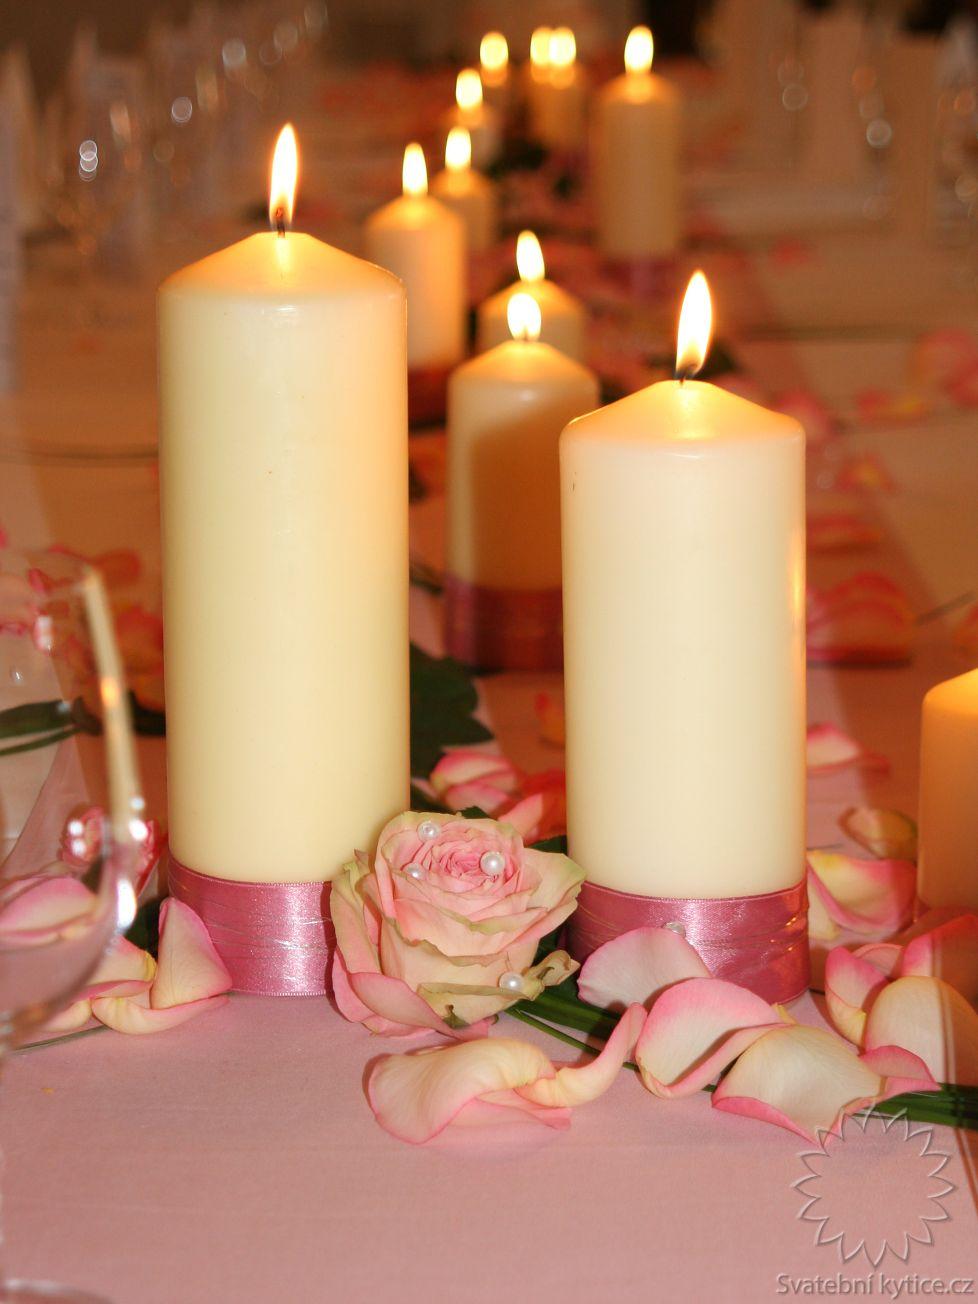 Kvetinova Dekorace Svatebni Tabule 342 Svatebni Kytice Cz